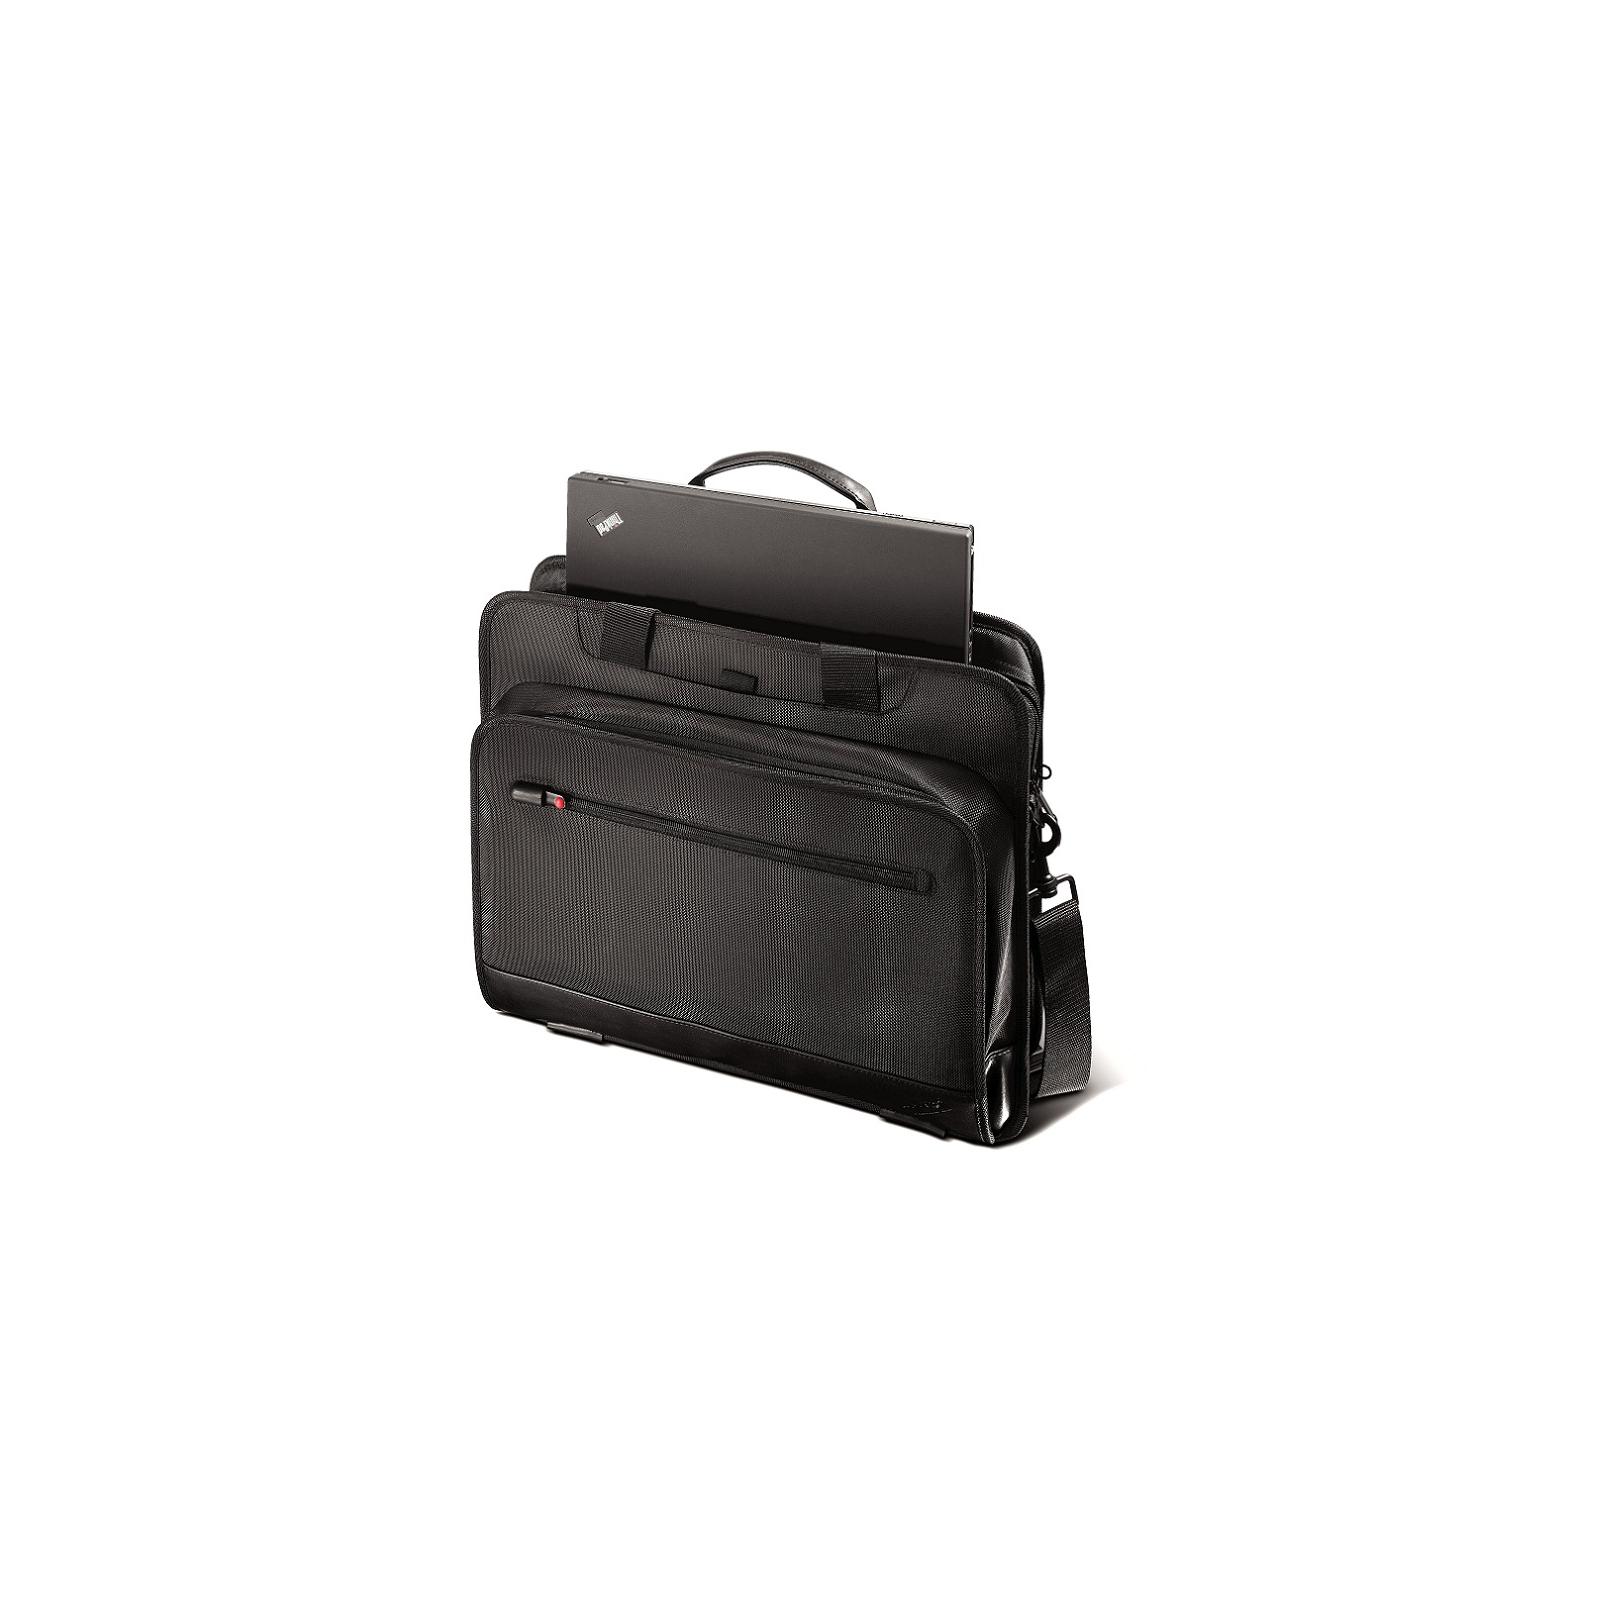 Сумка для ноутбука Lenovo 15.4 ThinkPad Business Topload Case (43R2476) изображение 2